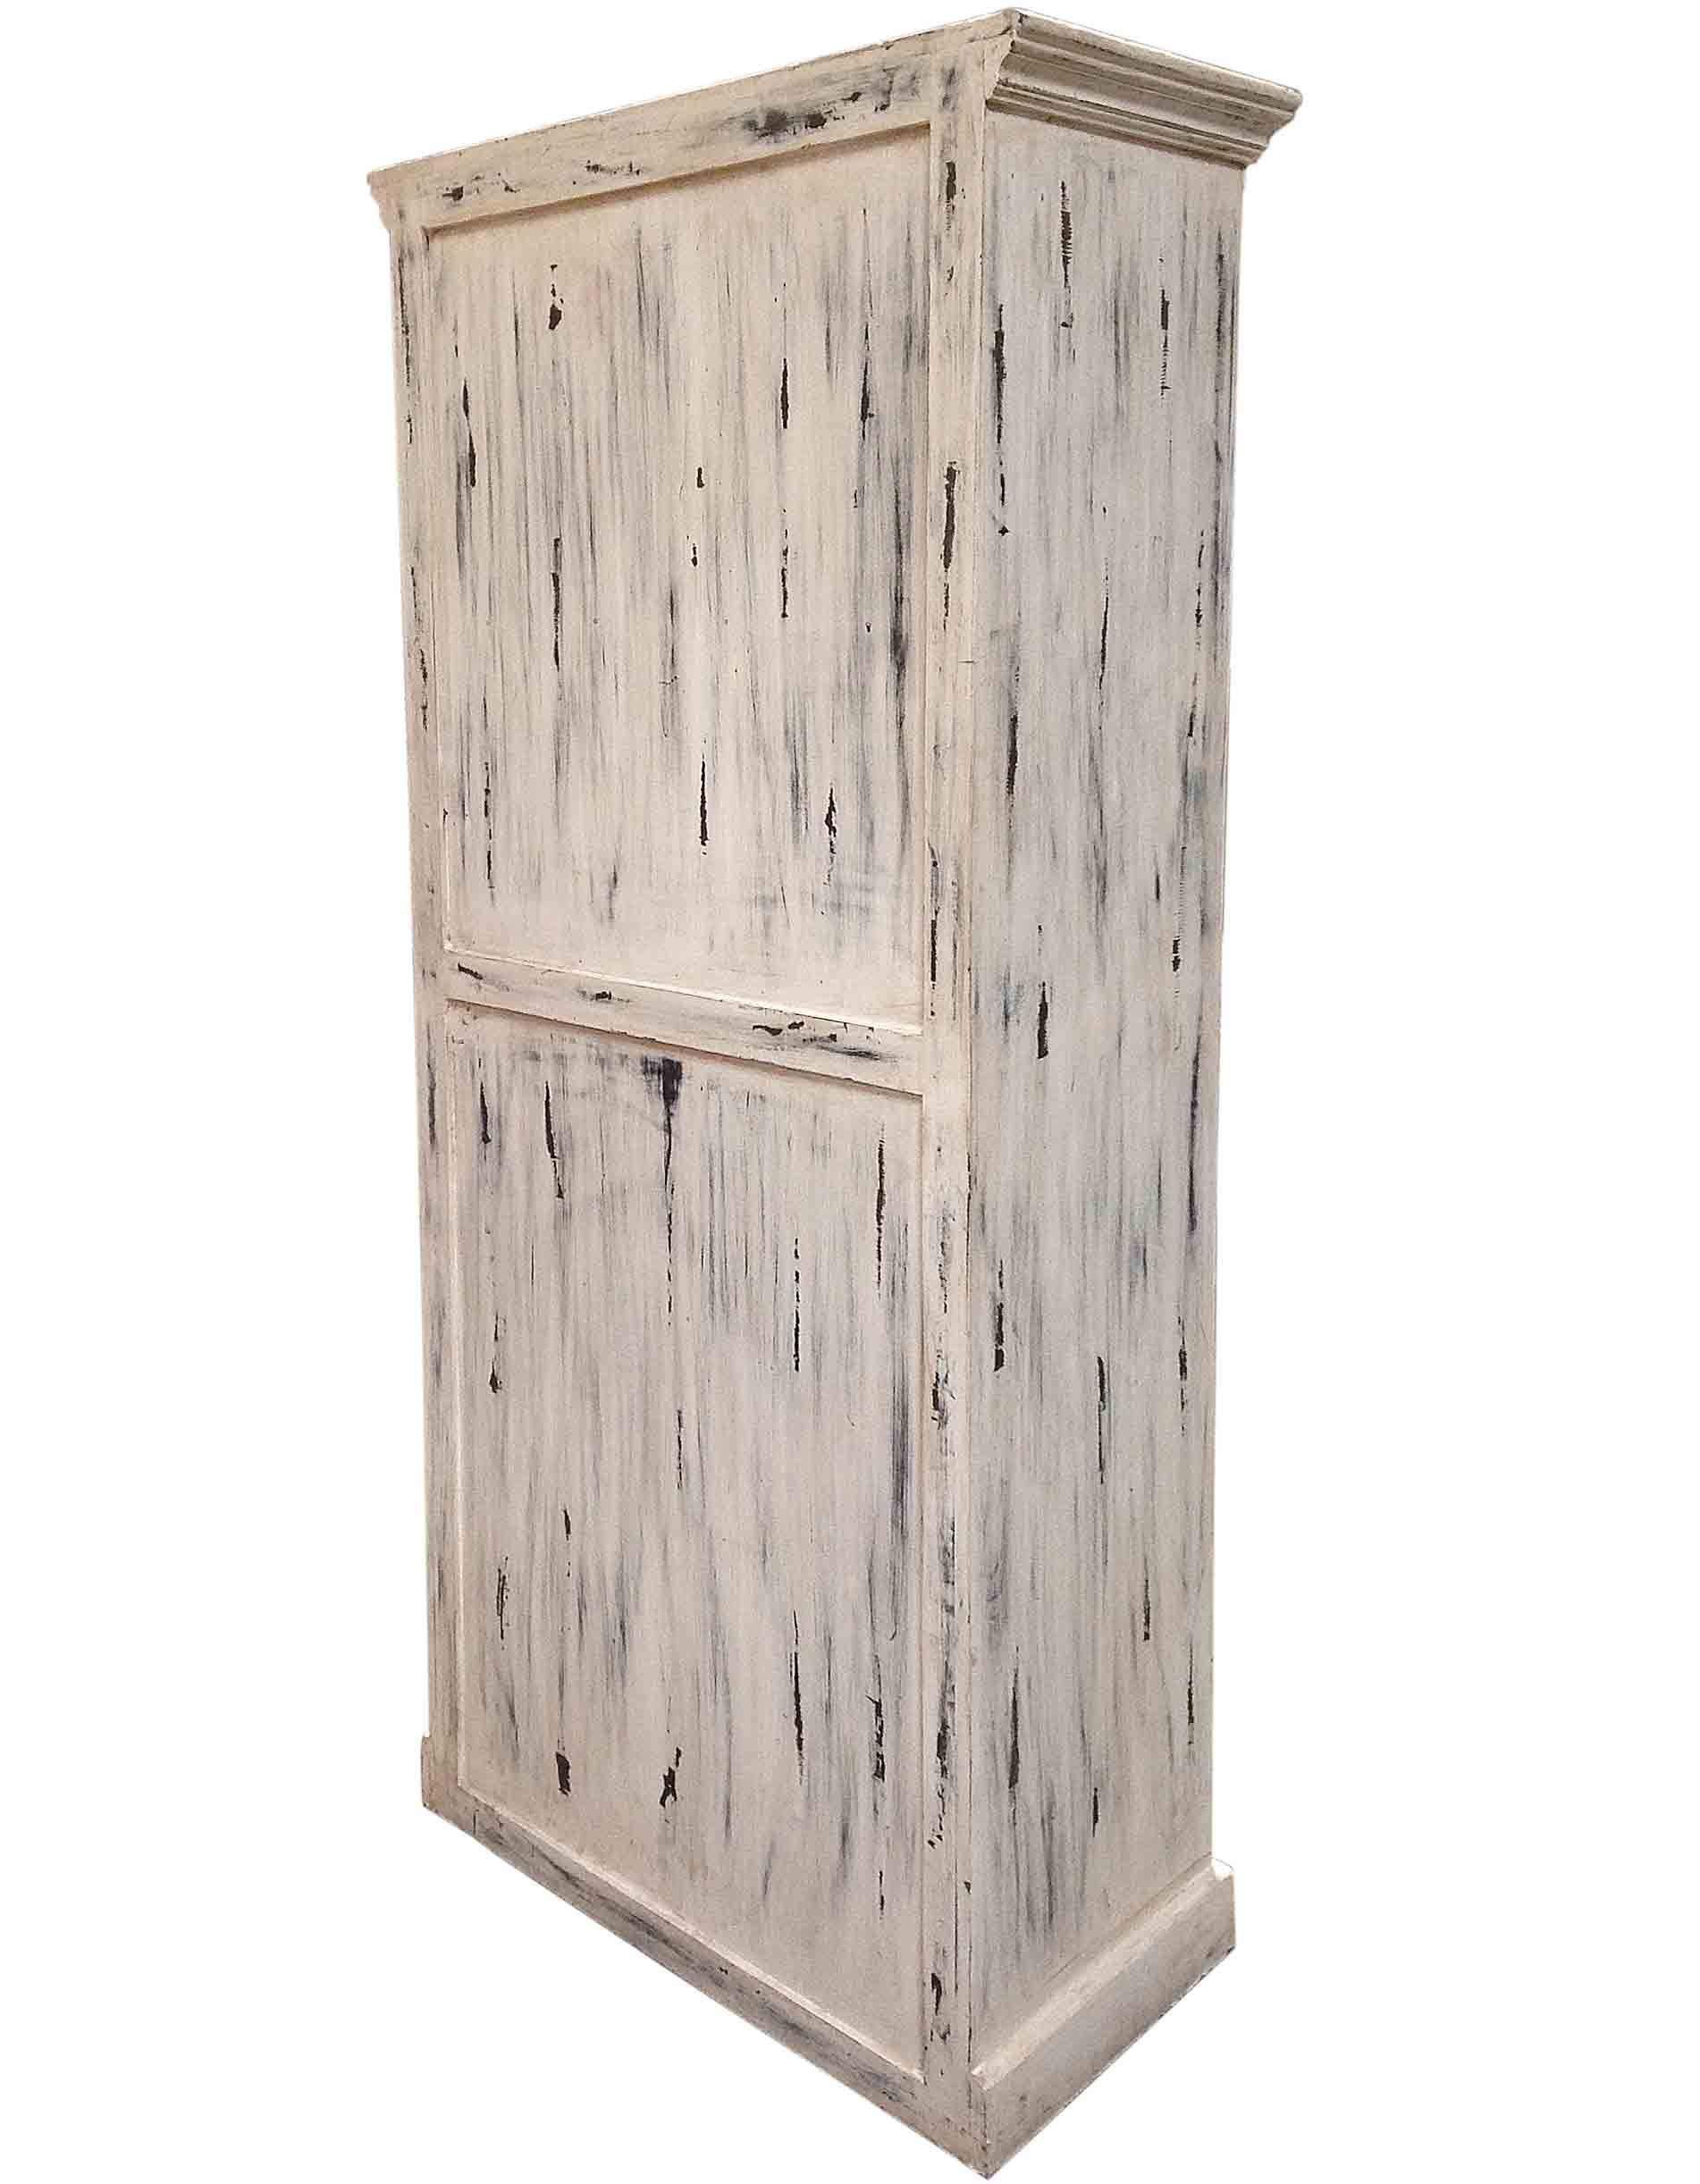 Distressed Kitchen Cabinet Doors: Distressed White Double Door Cabinet